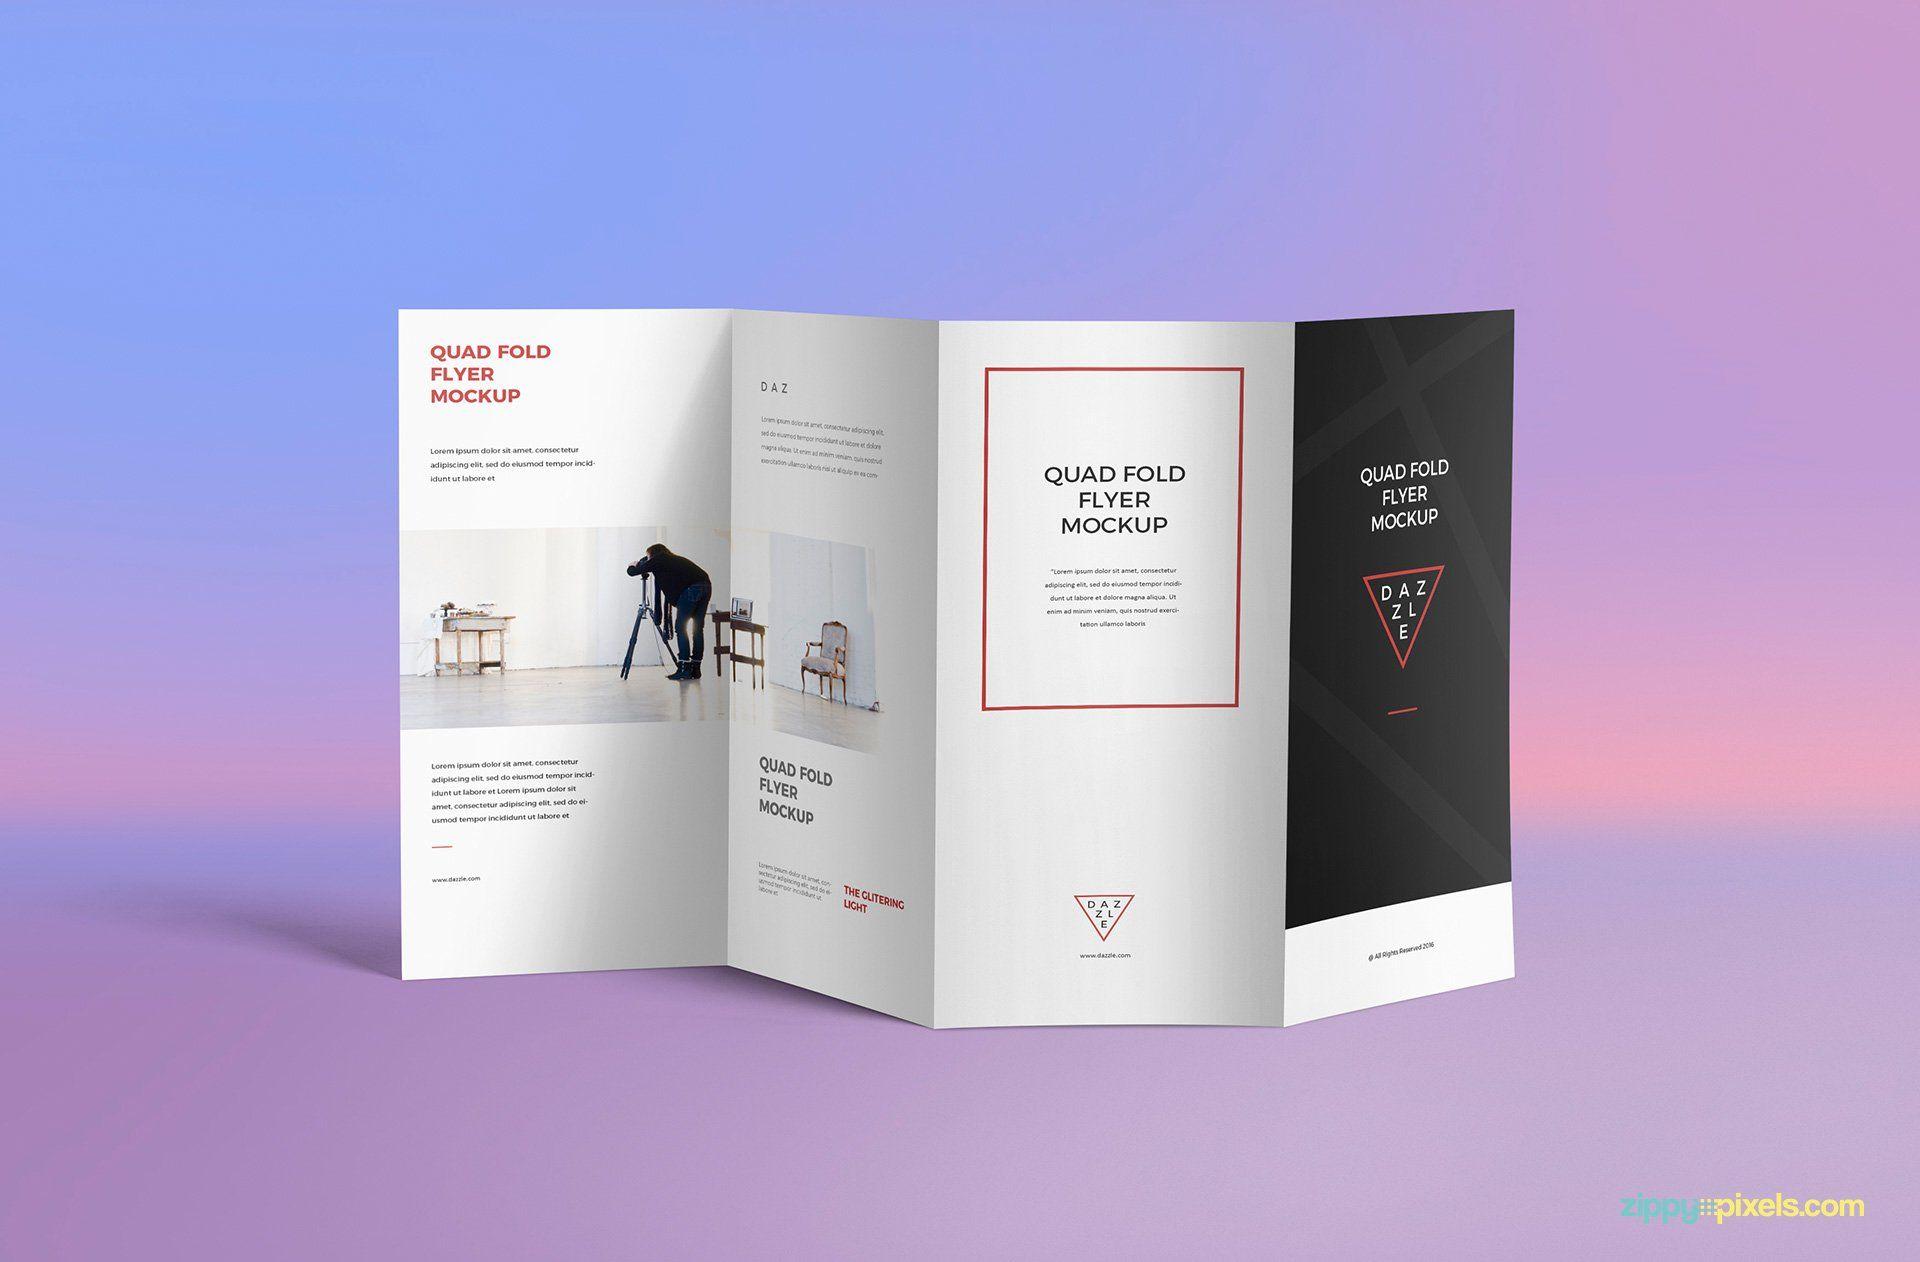 005 Quad Fold Brochure Template Dreaded Ideas Word Free In 4 Fold Brochure Template Word